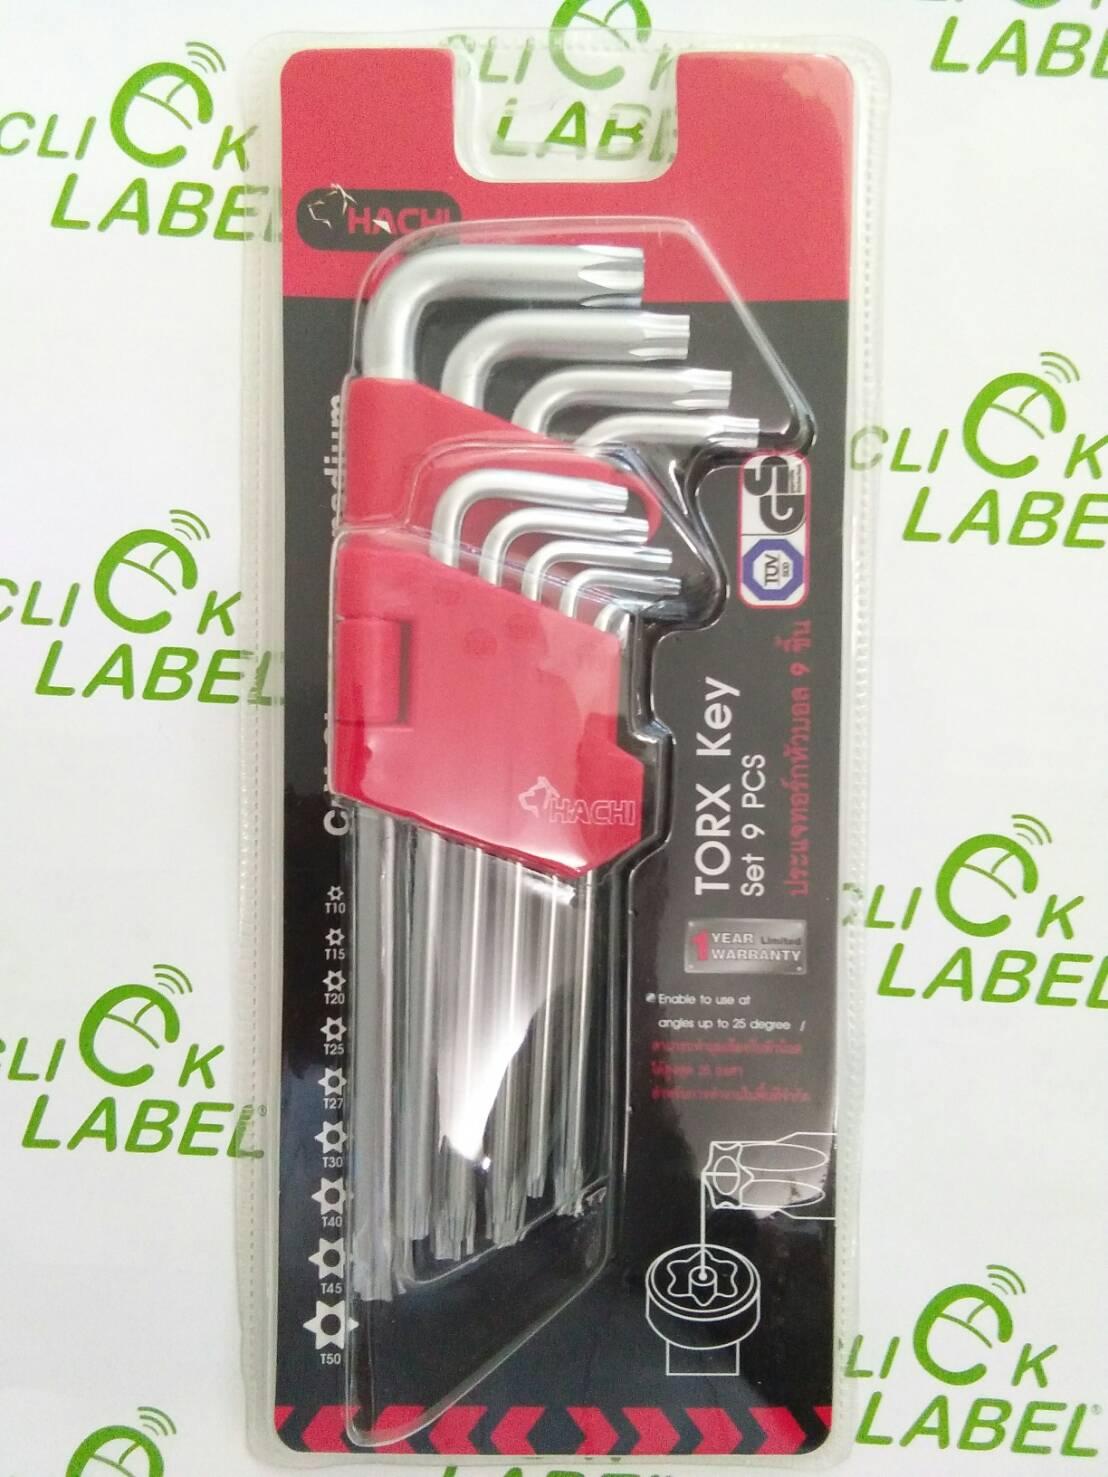 Tools (เครื่องมือช่าง) Torx Key Set 9 Pcs.